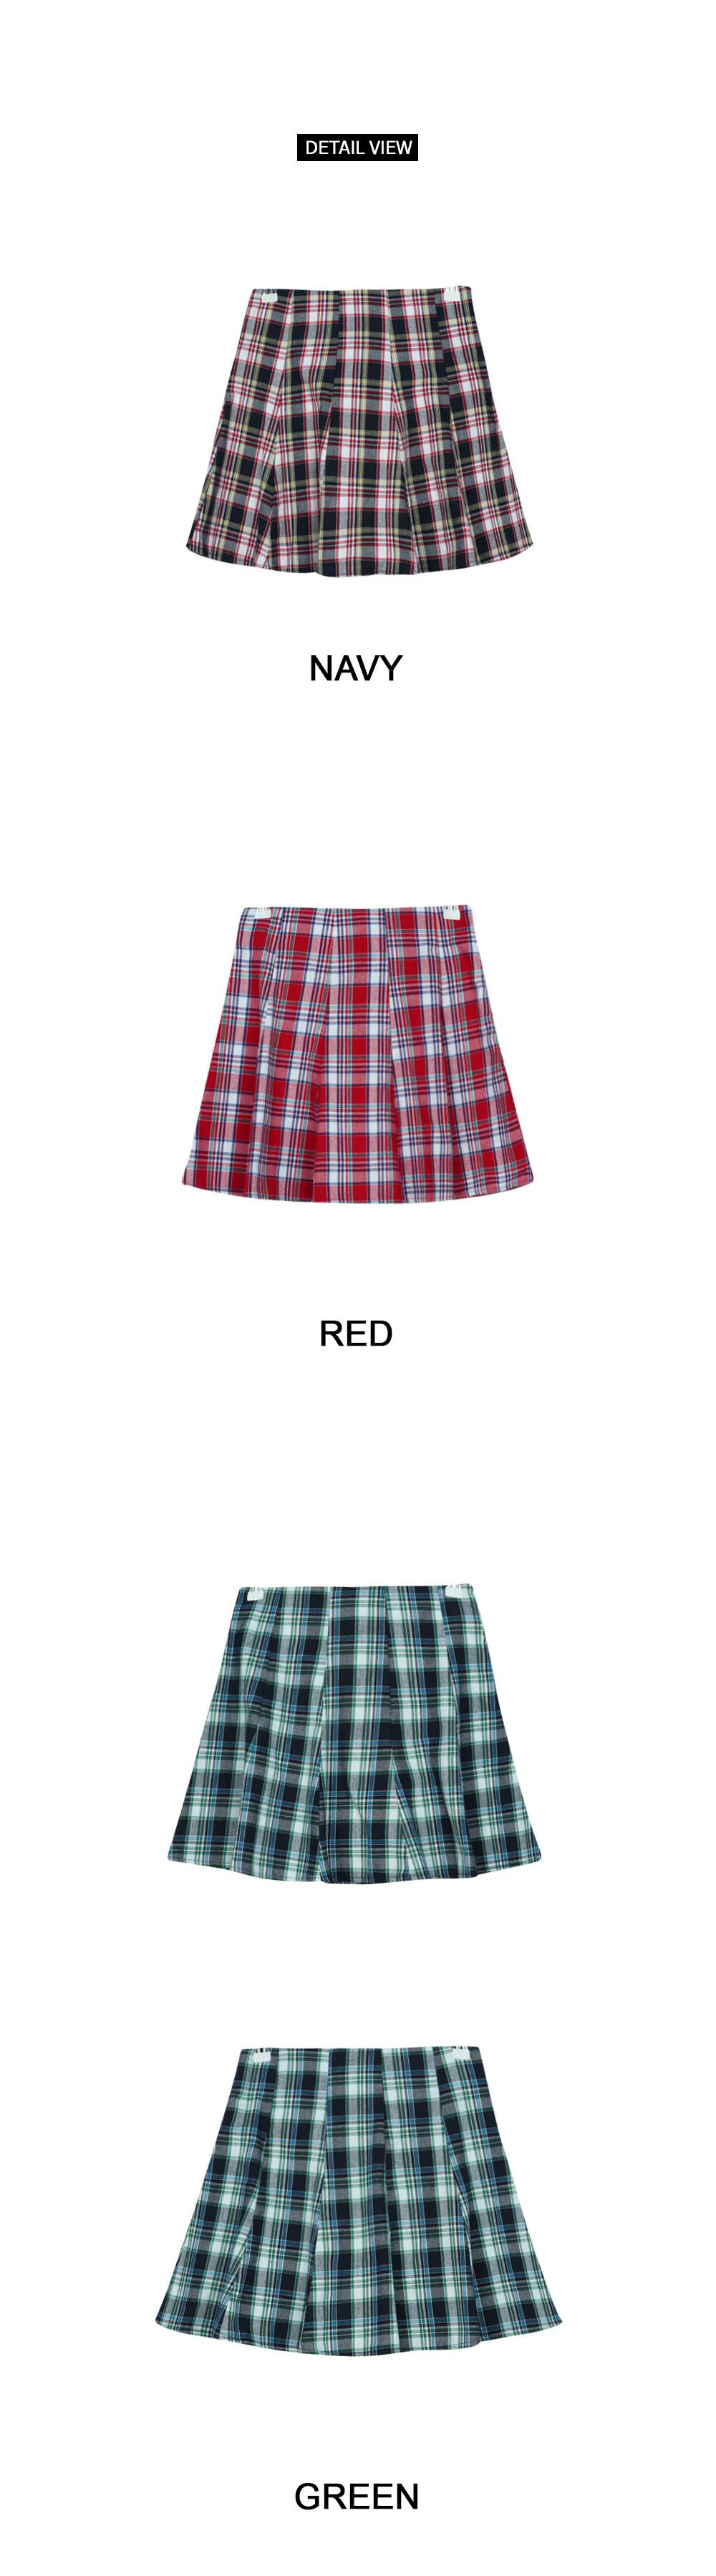 Joy check skirt